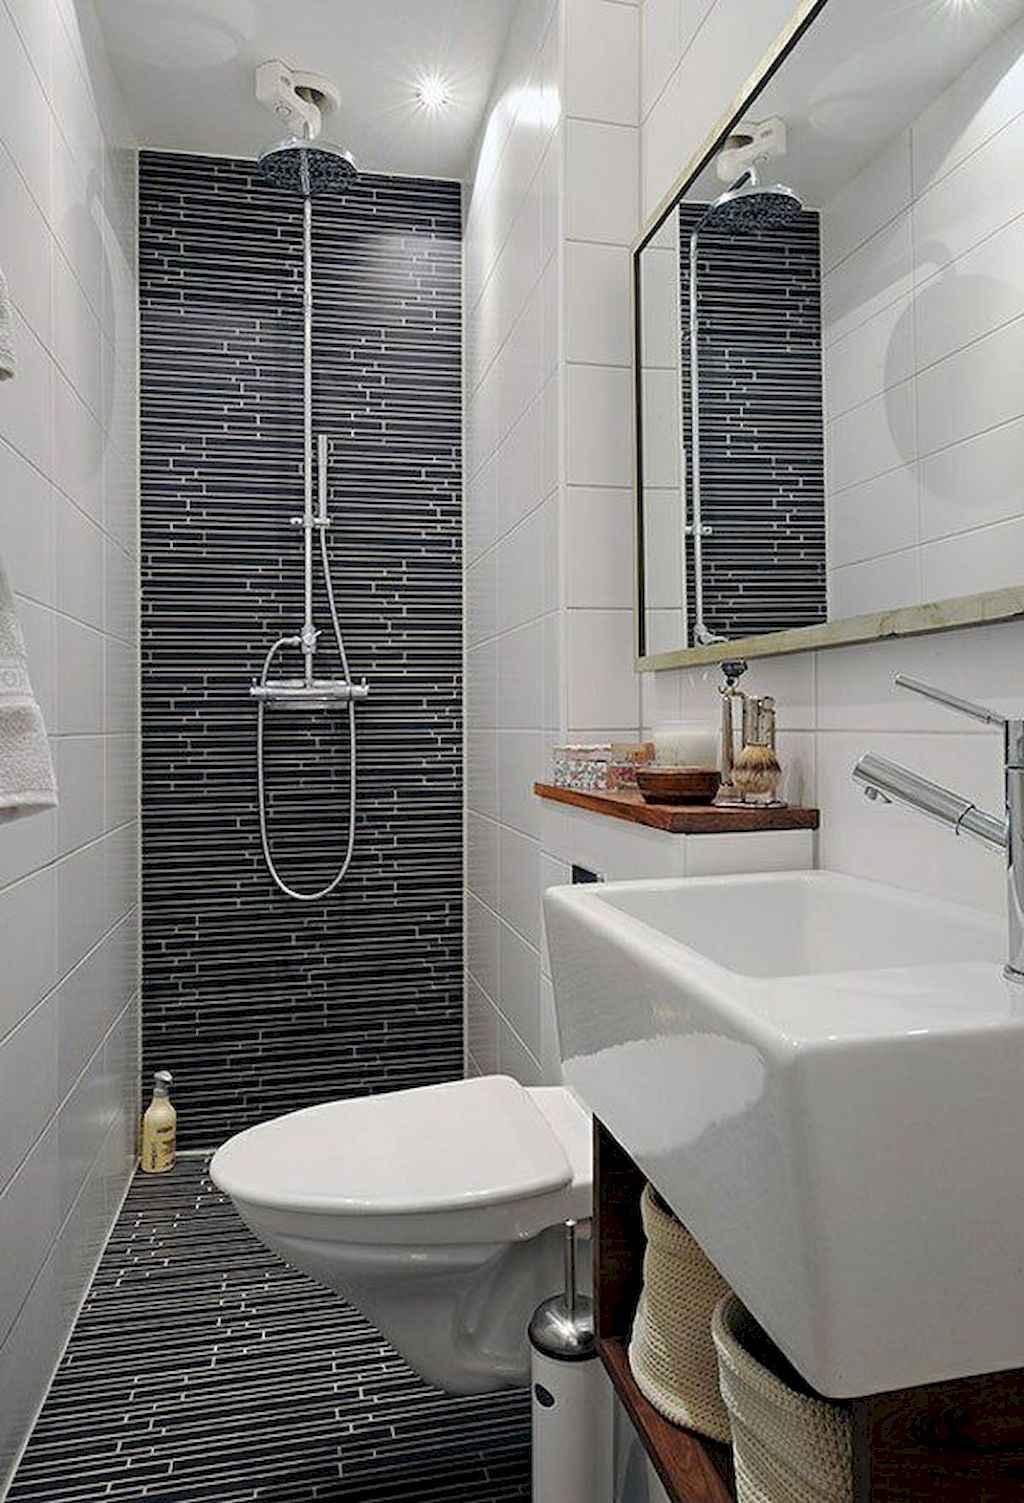 111 Brilliant Small Bathroom Remodel Ideas On A Budget (8)